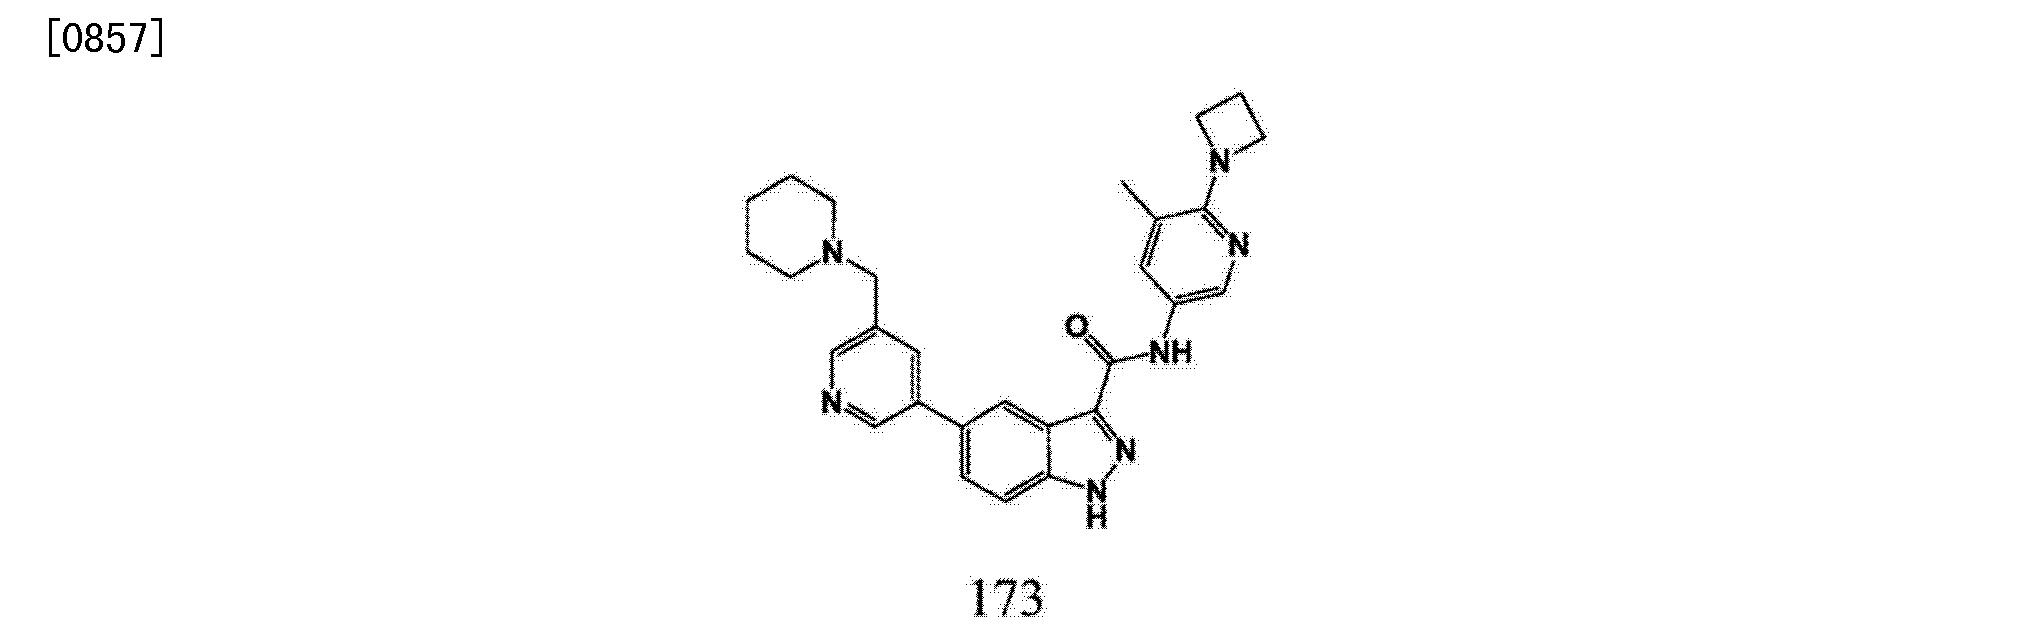 Figure CN103929963AD02022